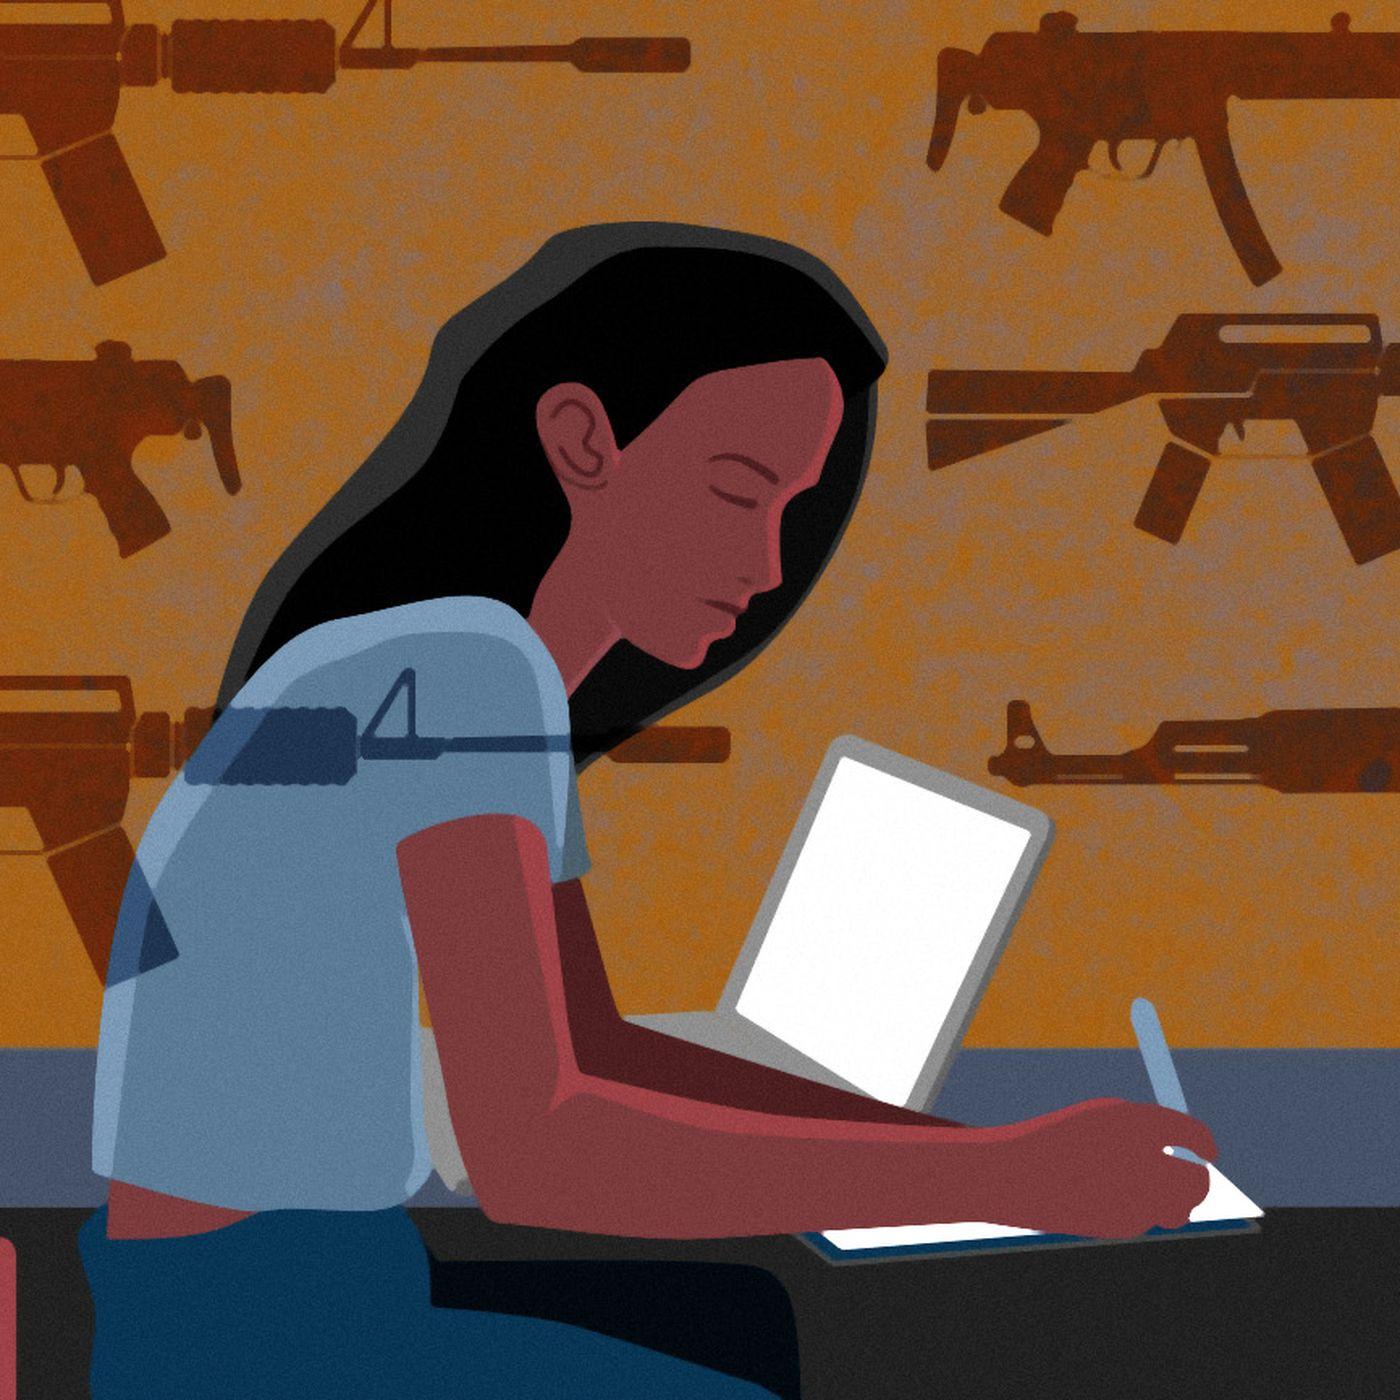 Wattpad, a popular writing platform, is full of school